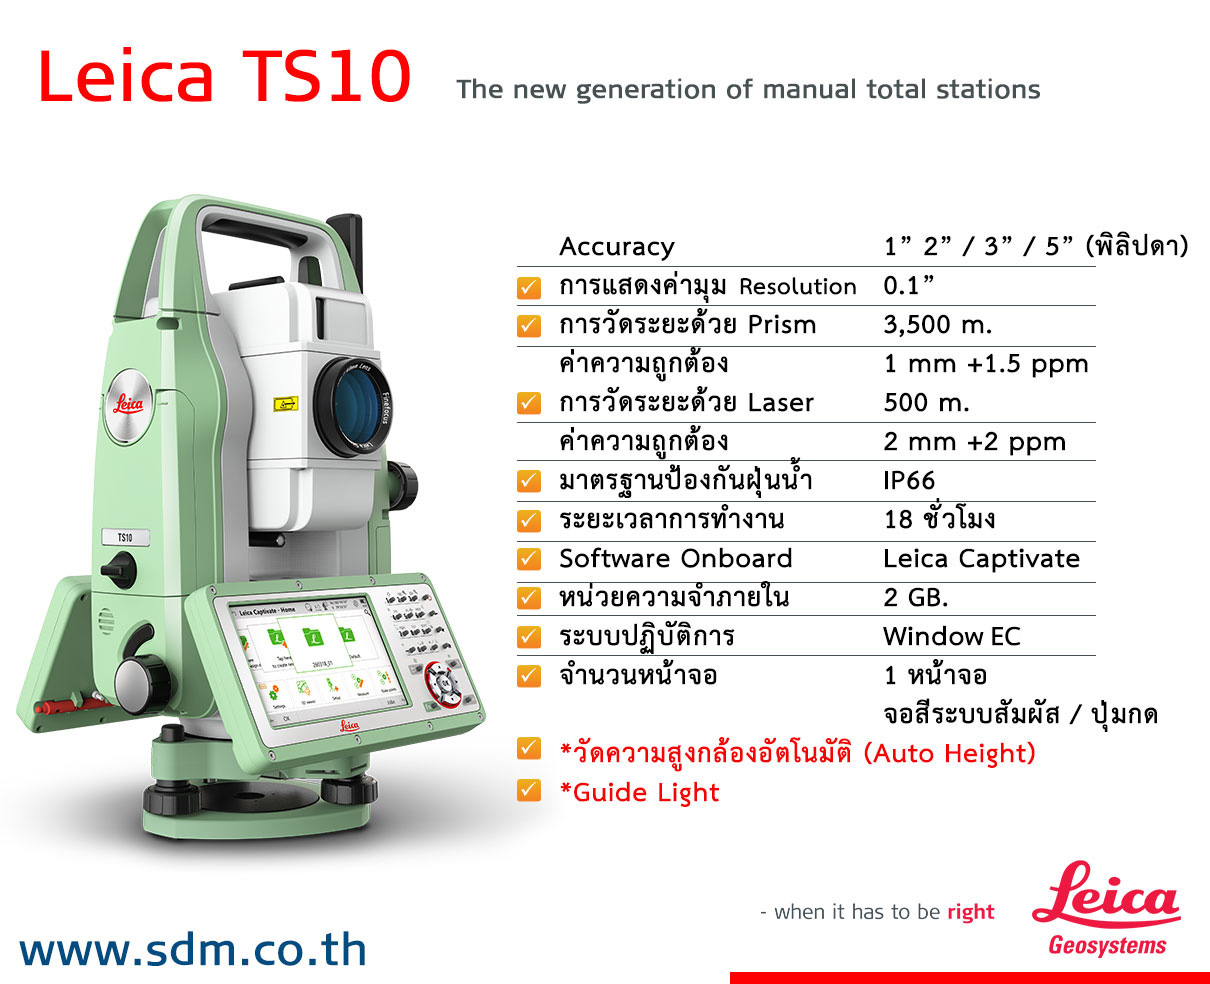 Leica New Flexline TS10, กล้องสำรวจ Leica TS10, กล้องเซอร์เวย์ Leica